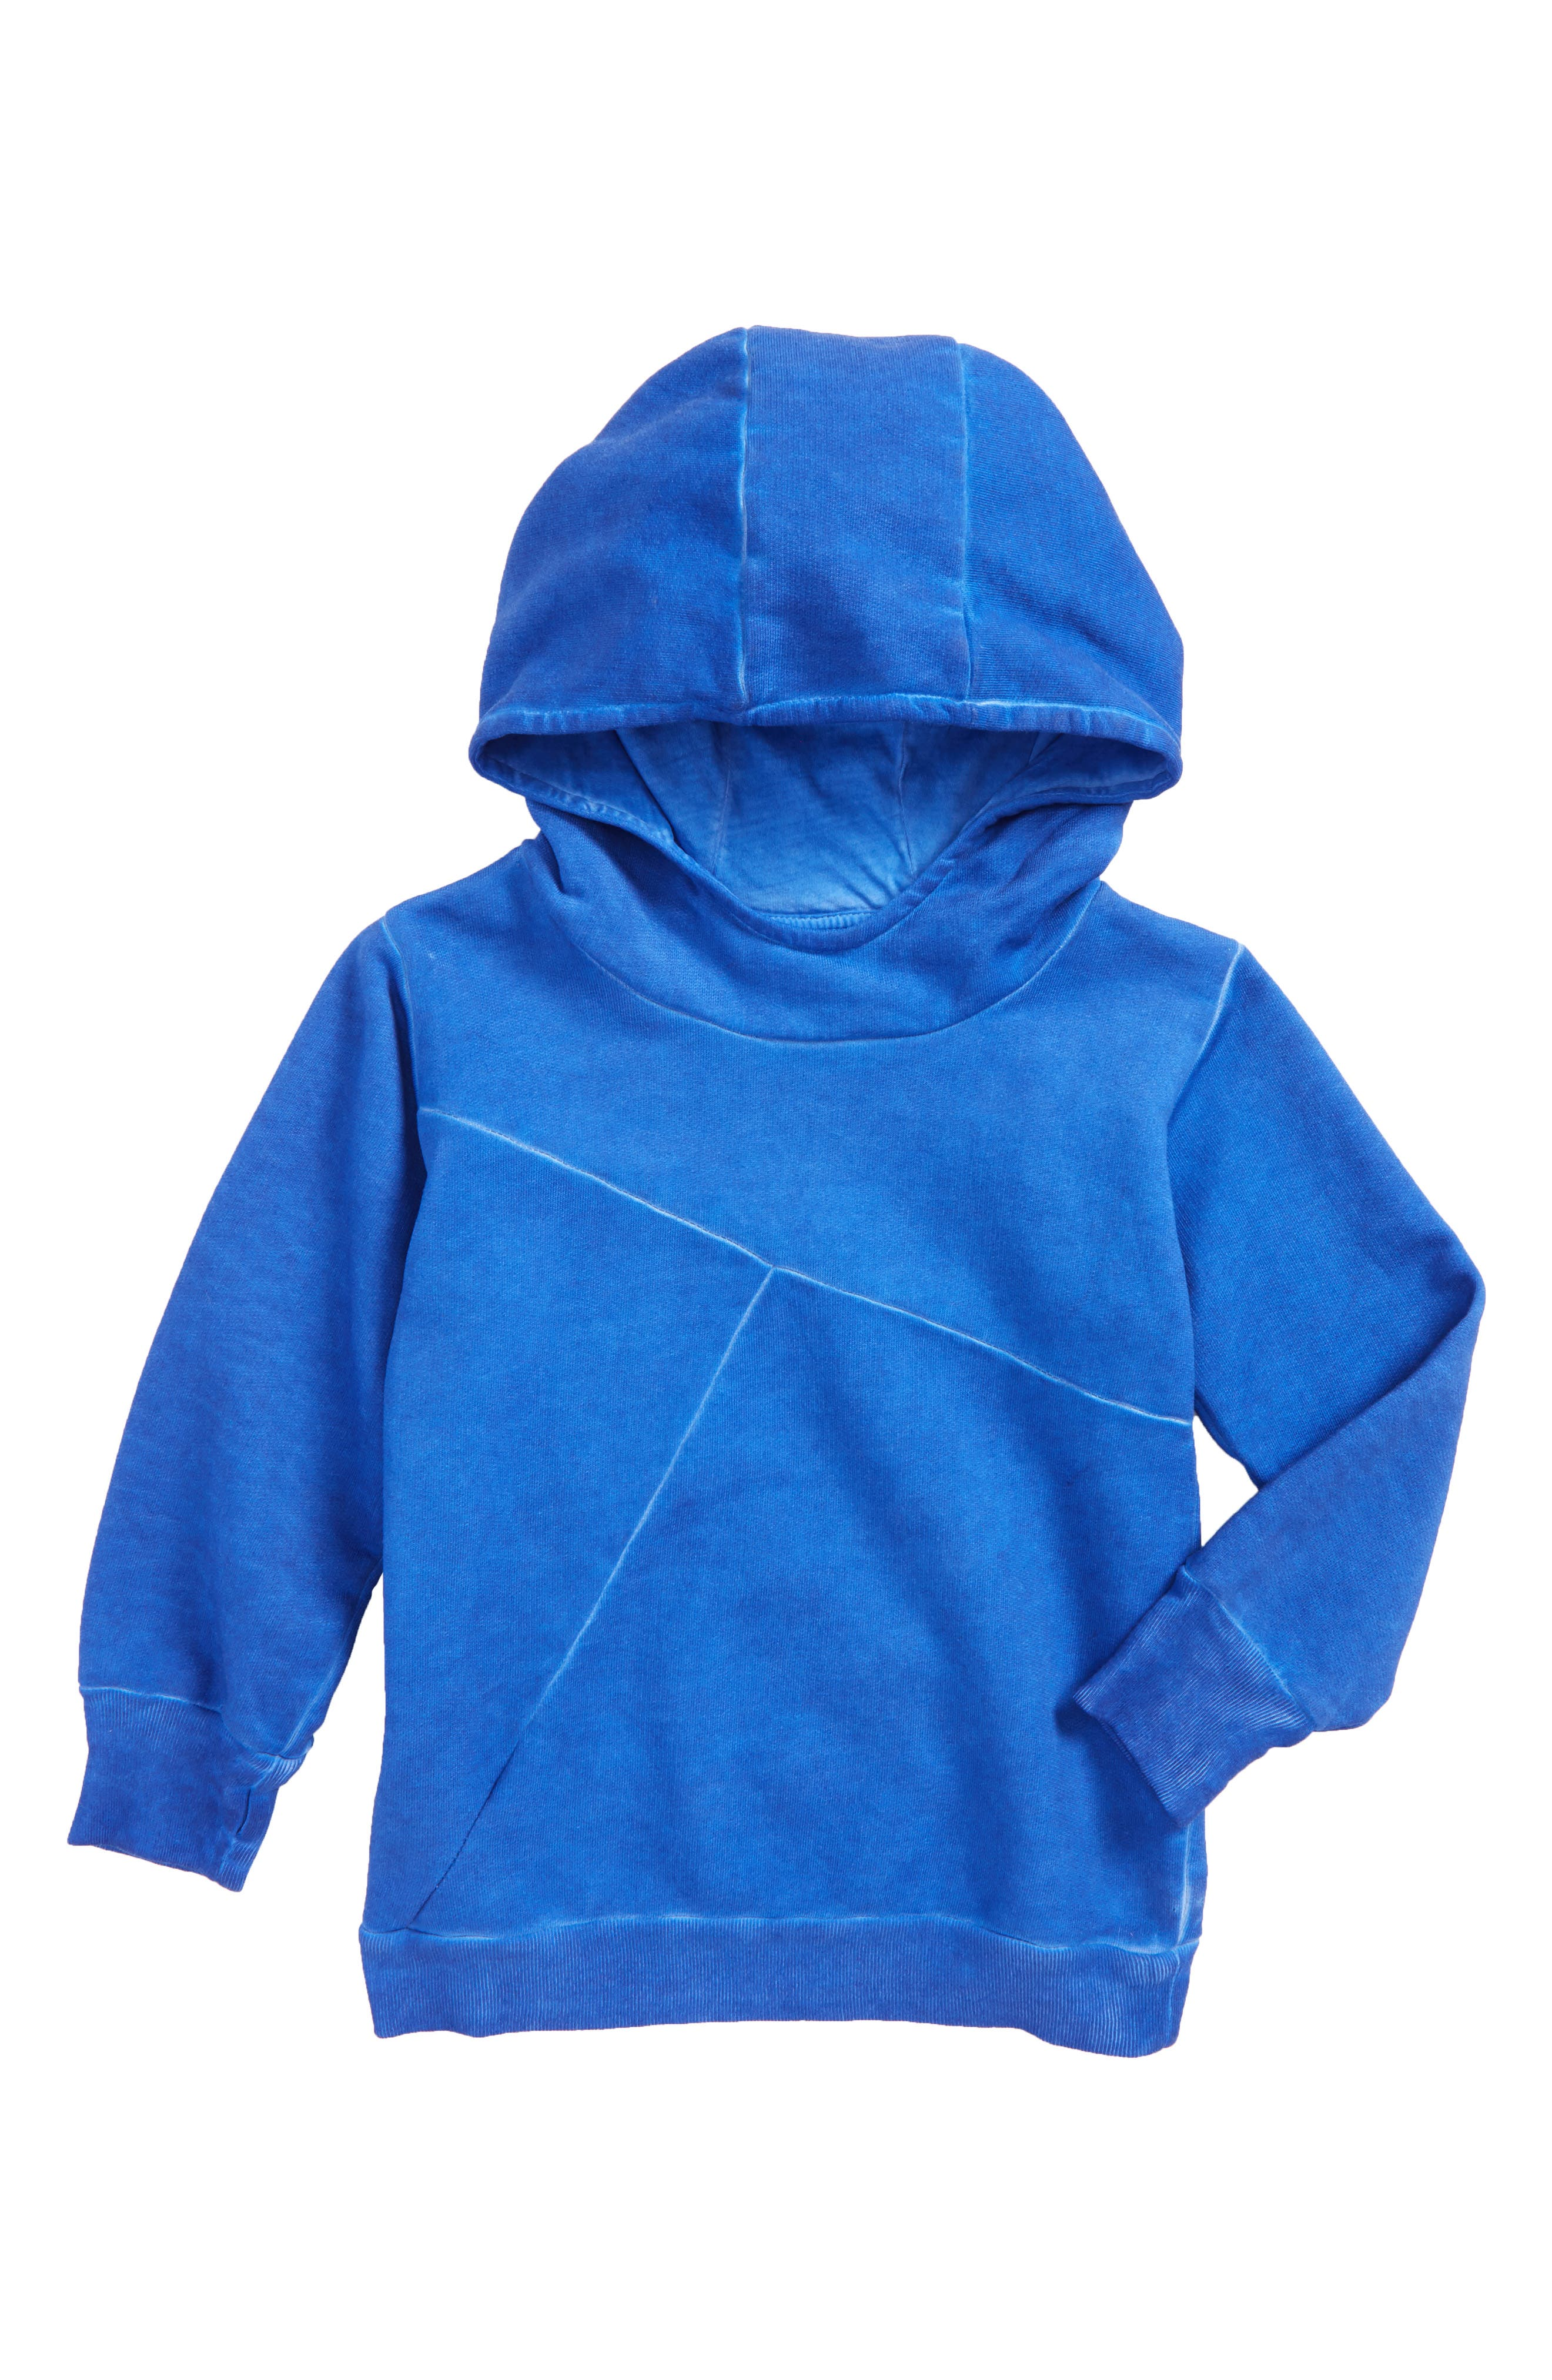 Main Image - NUNUNU Numbered Hoodie (Toddler Boys & Little Boys)